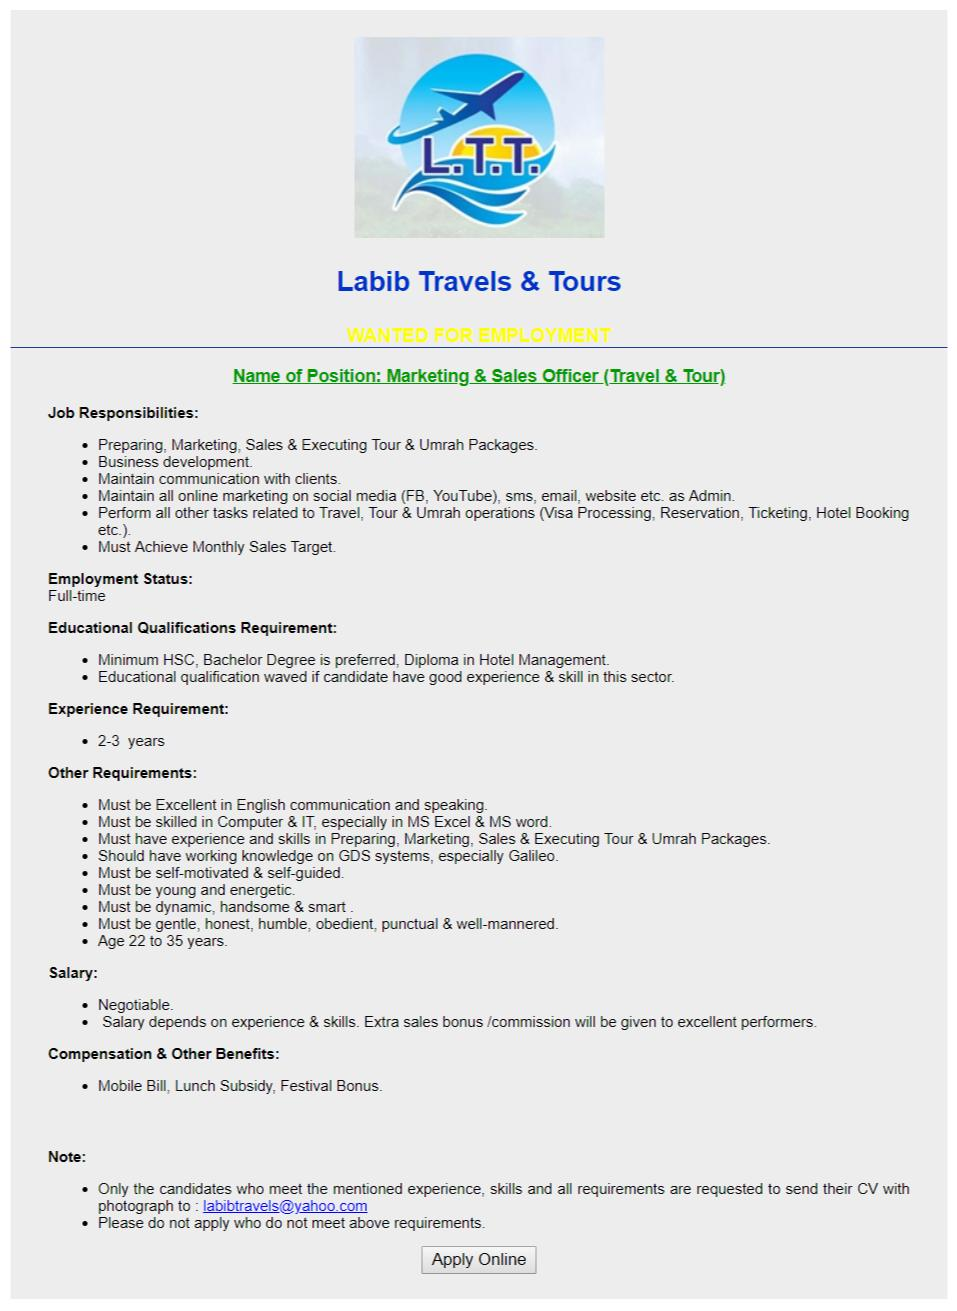 Labib Travels & Tours